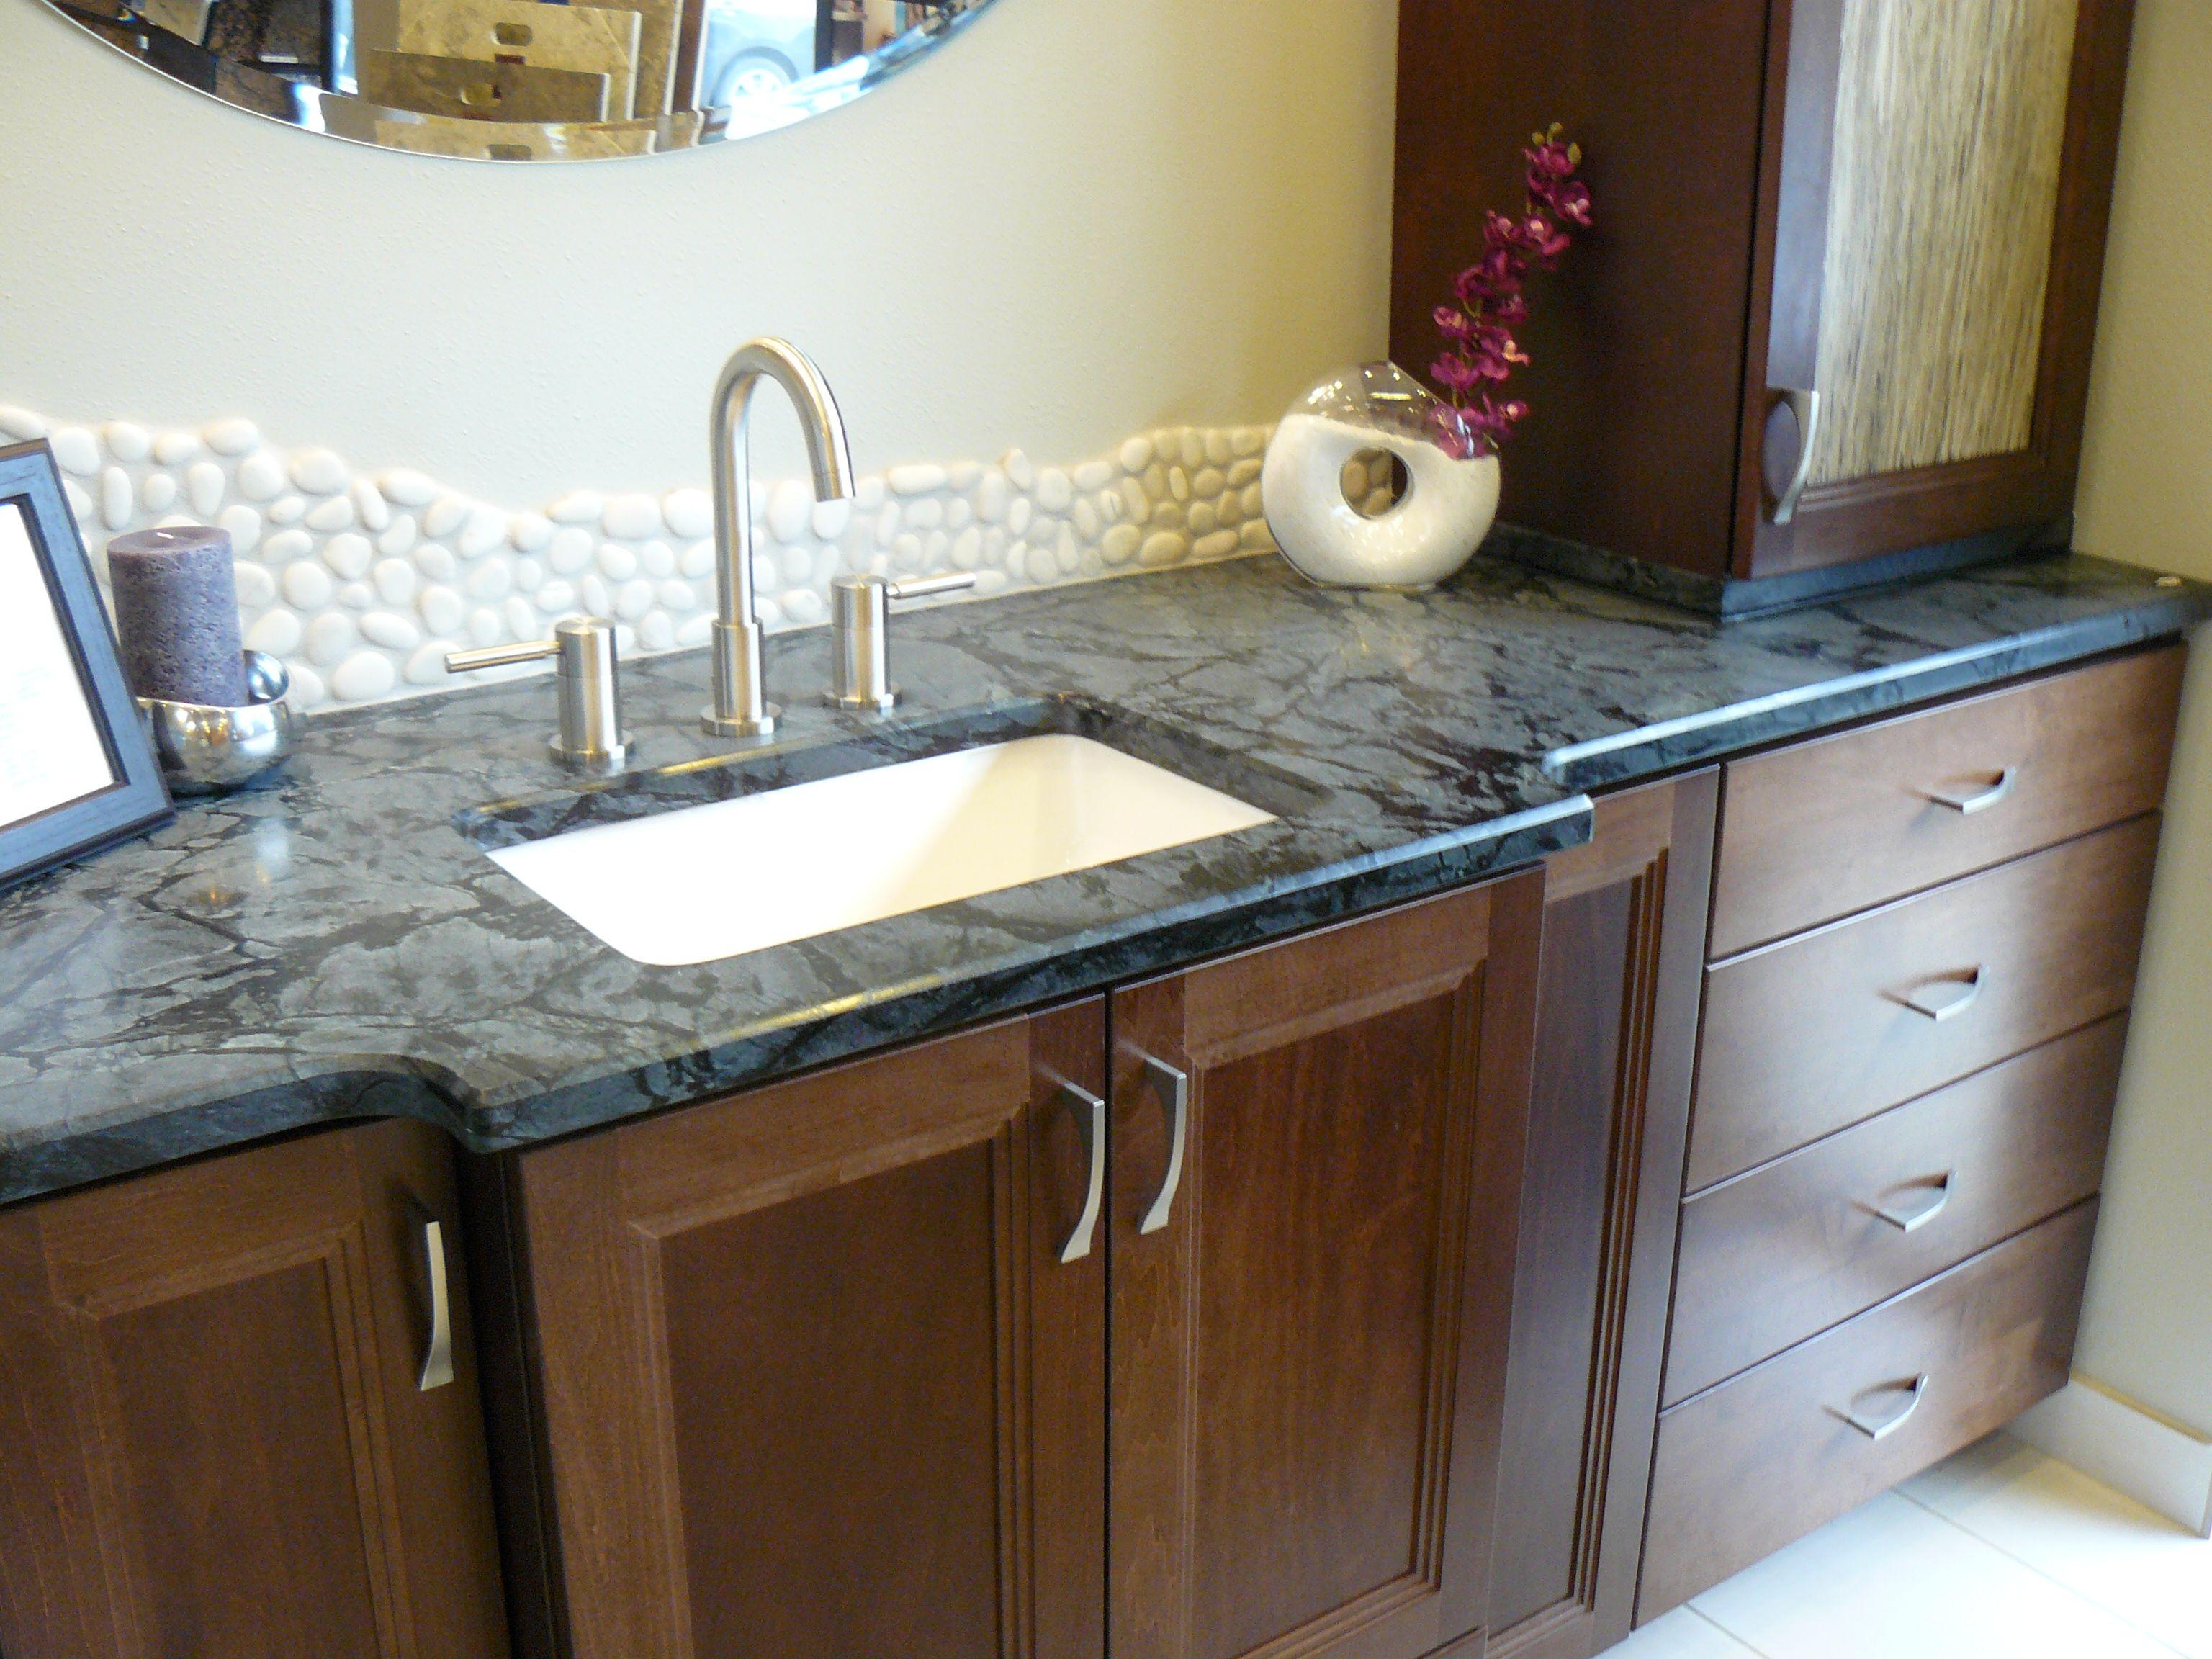 Light And Dark Blue Granite Countertop The Versatility Of The Granite Makes It Work In Eve Arbeitsplatte Modernes Badezimmerdesign Kuchen Granitarbeitsplatten